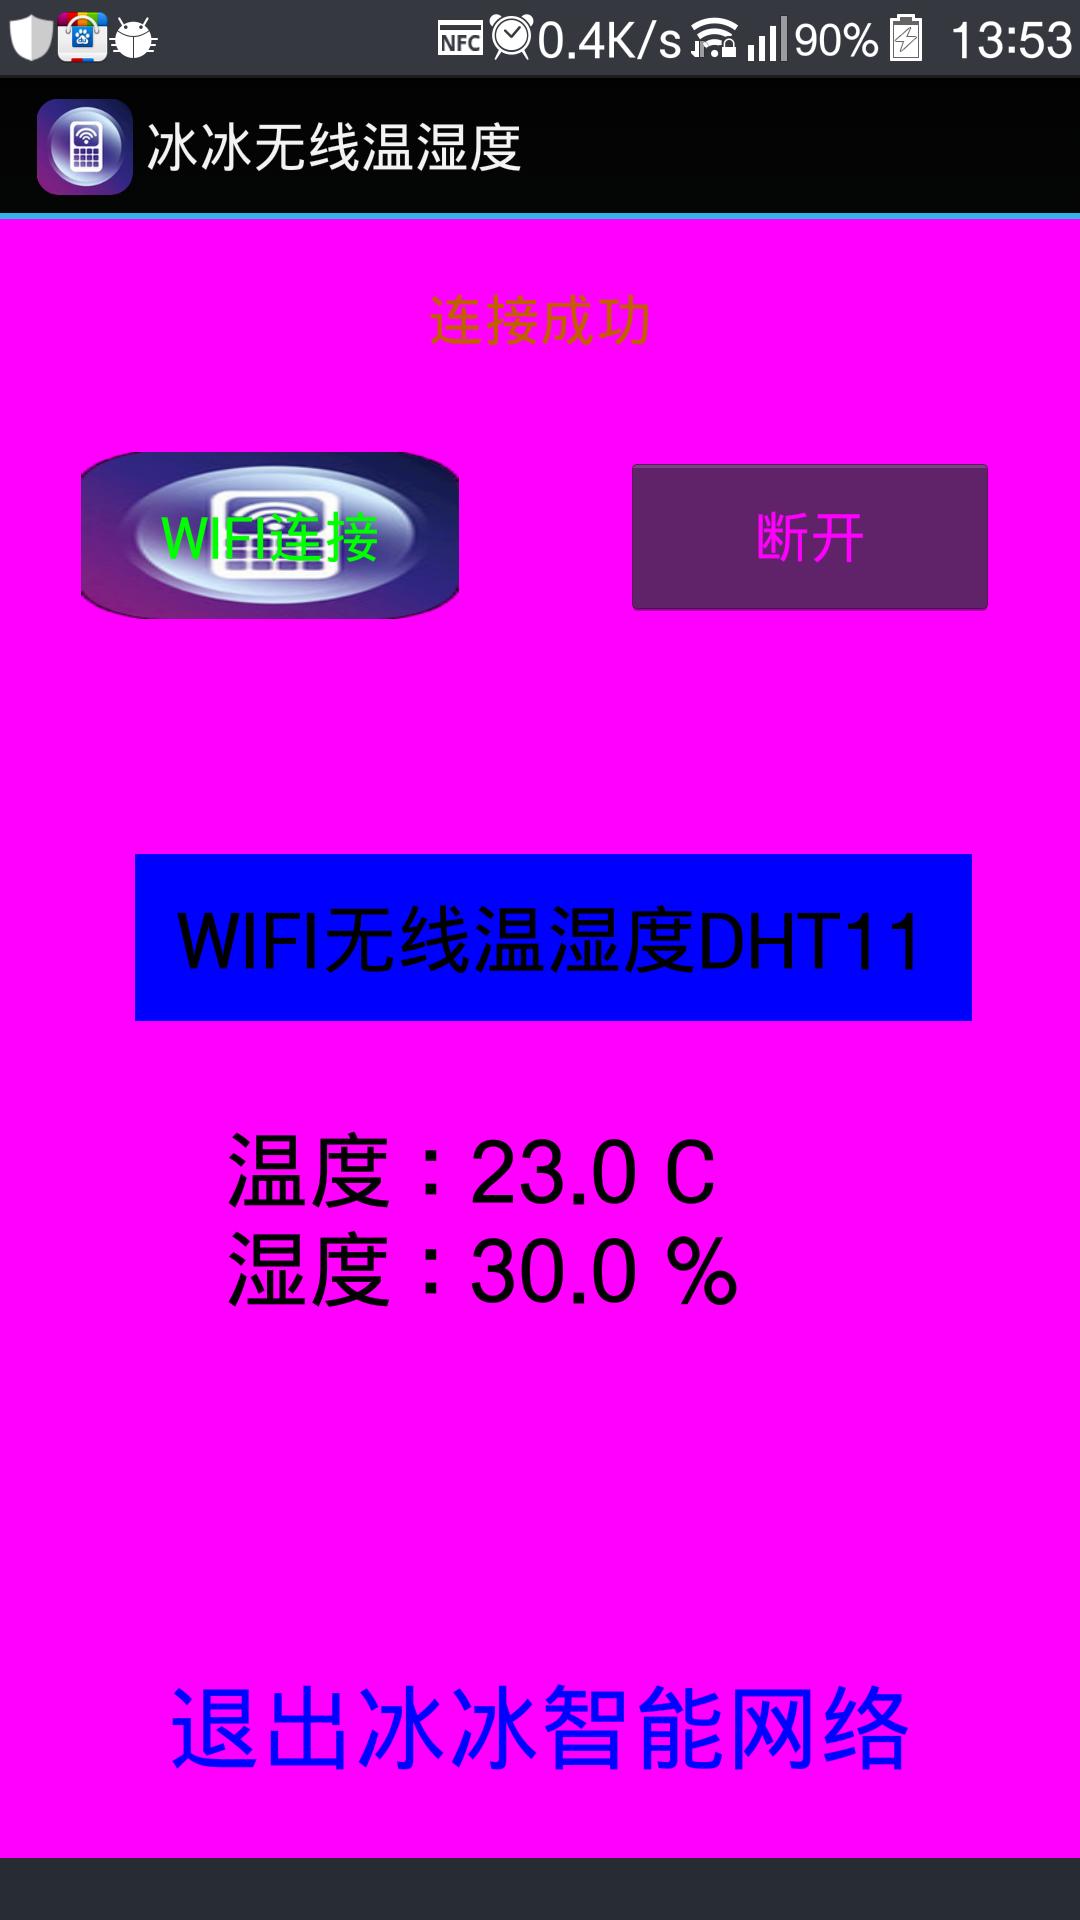 Screenshot_2019-01-12-13-53-55.png